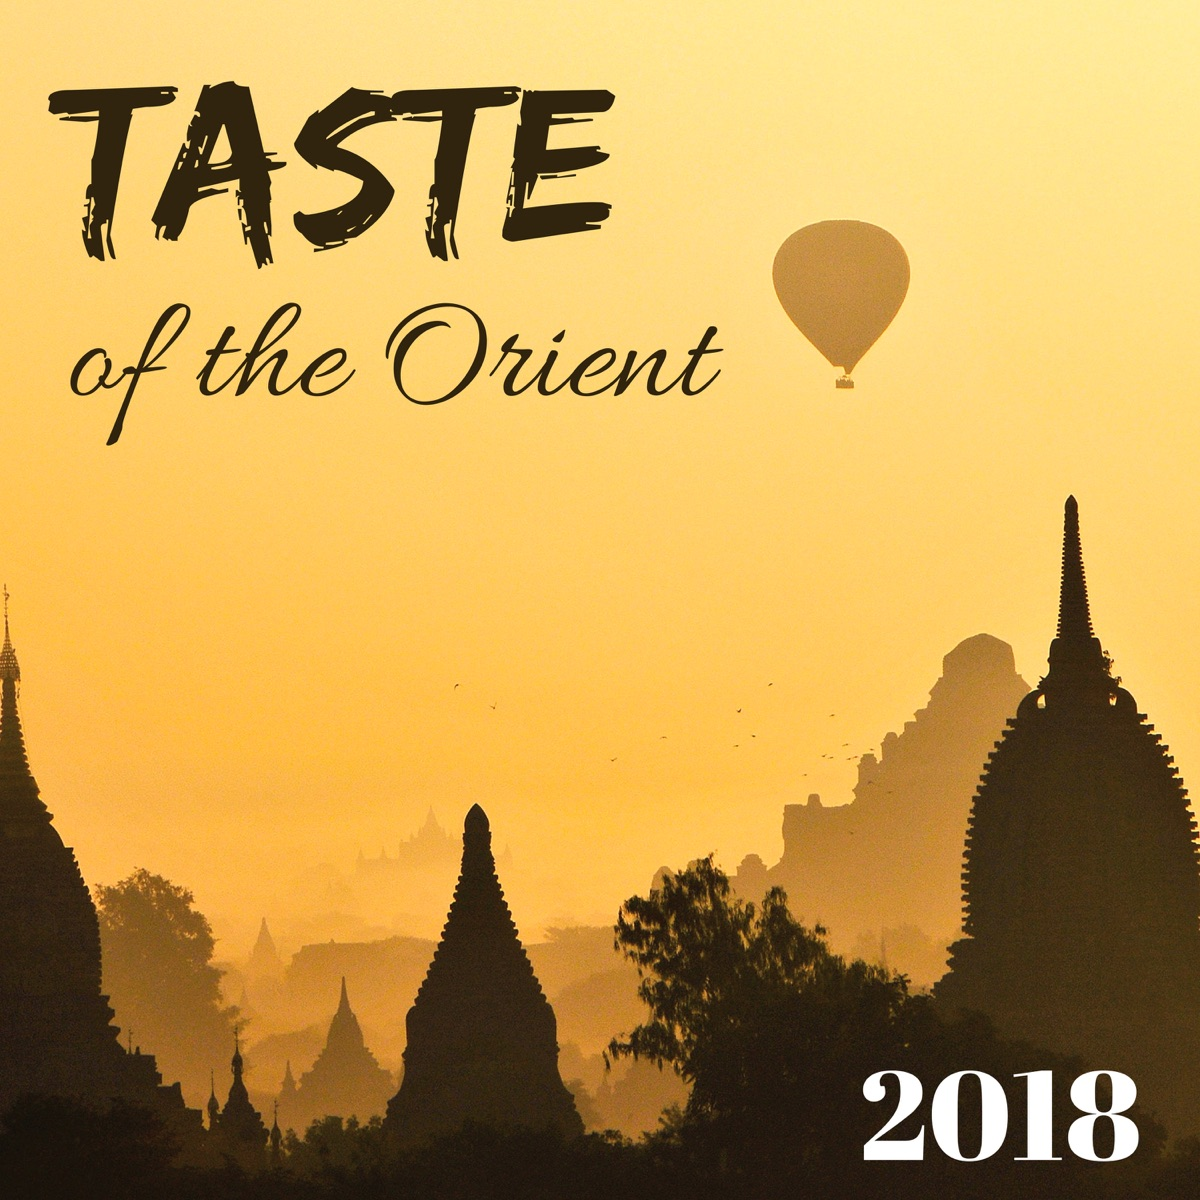 Taste of the Orient 2018 - Meditation with Sitar, Chill Zen Music